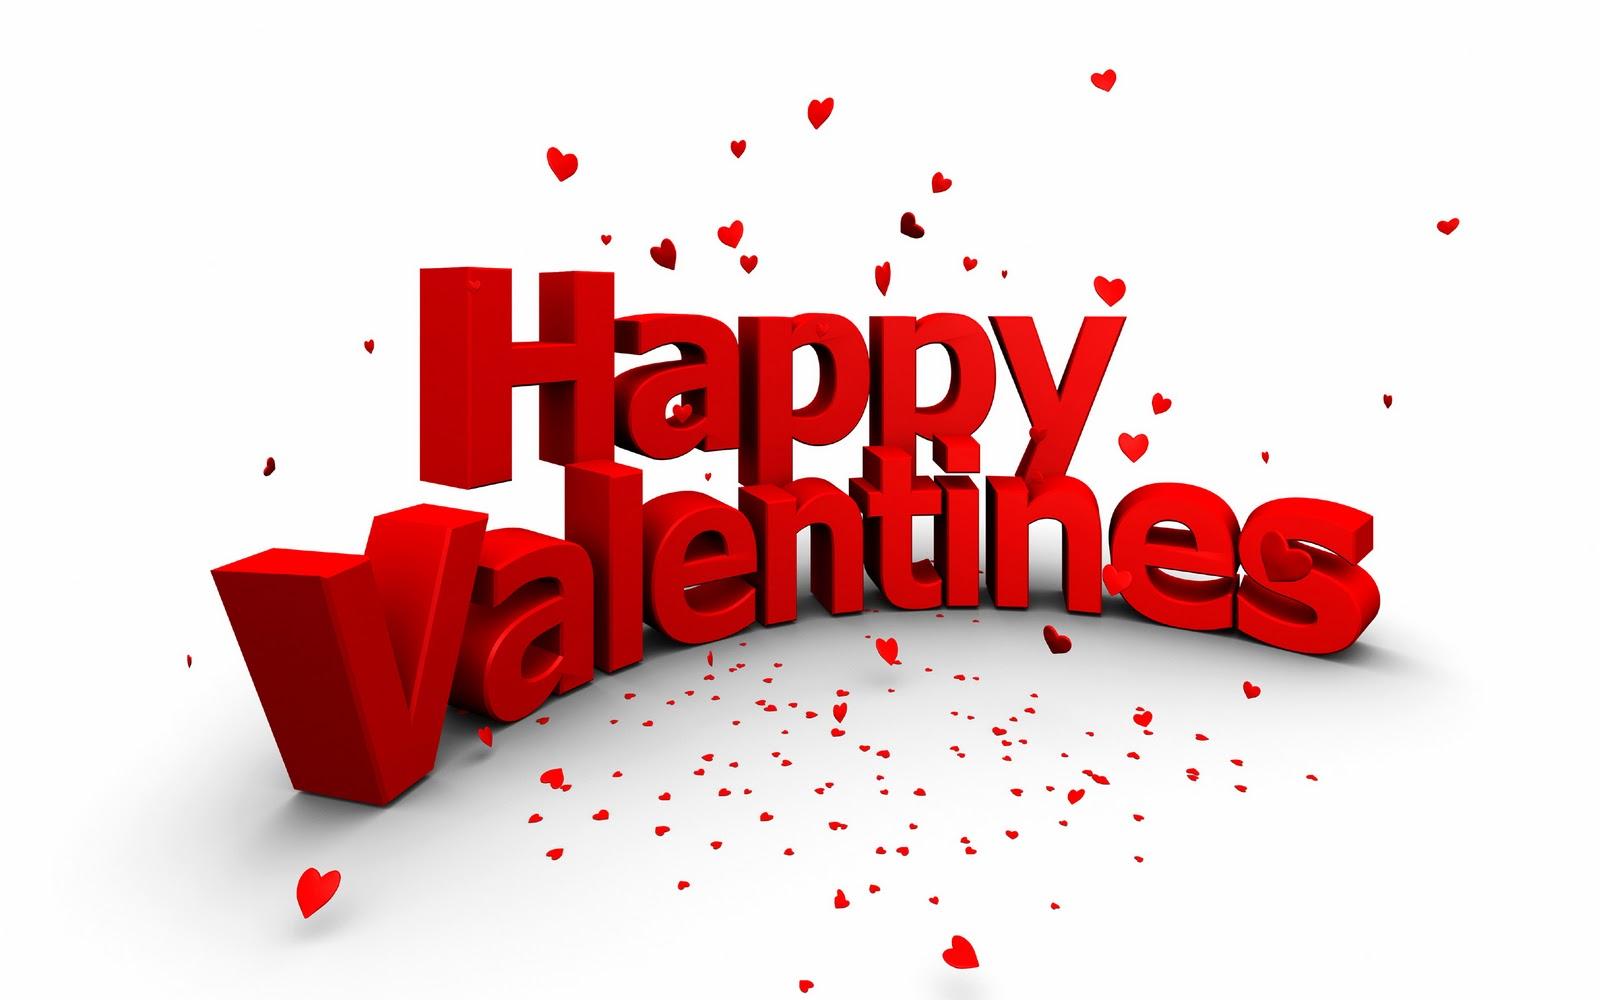 http://4.bp.blogspot.com/-wZmEKYJ7ARM/TyLFam_fMII/AAAAAAAAAlg/OXvQEVxuG4Y/s1600/happy_valentines_hd_wide-wide.jpg